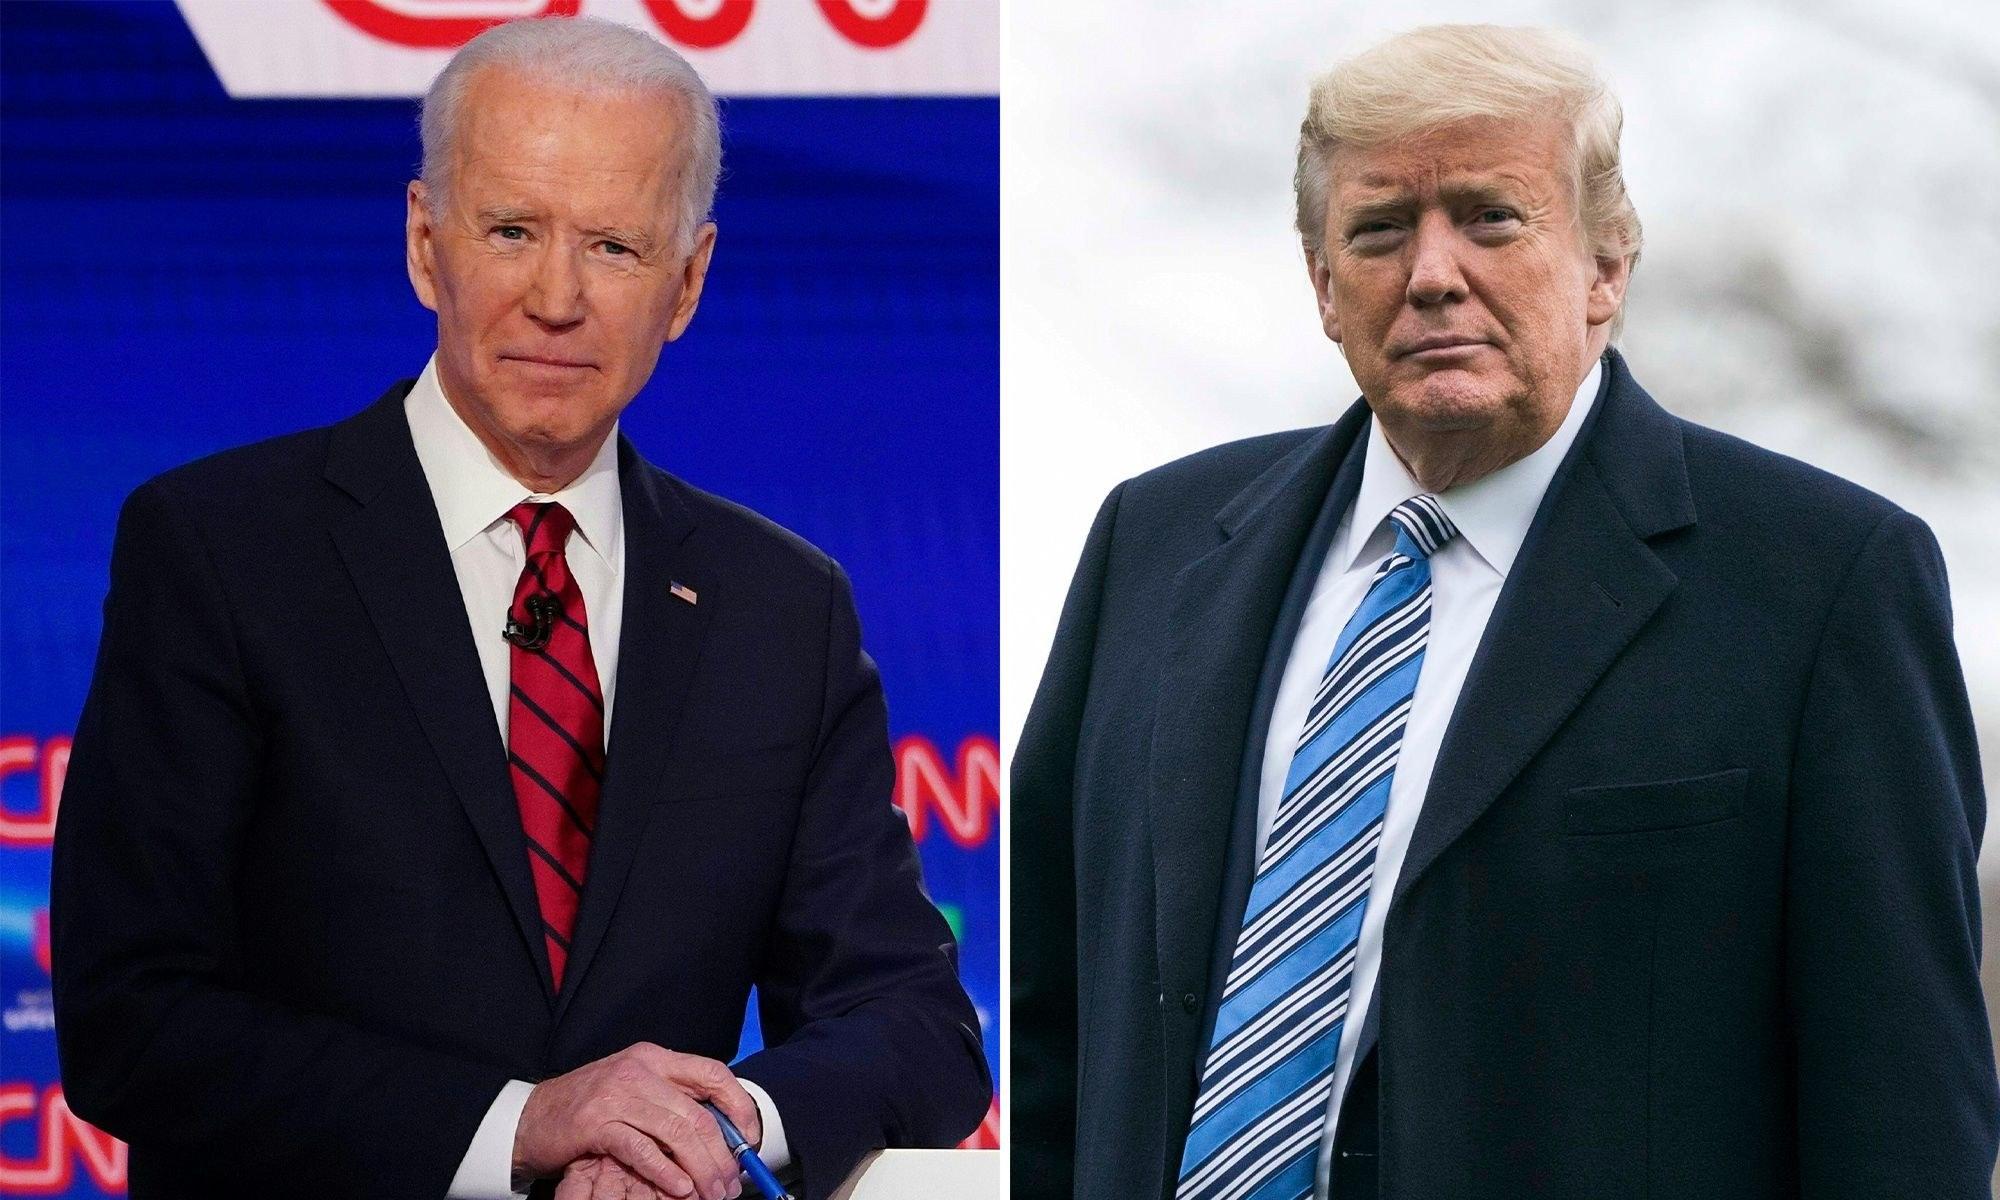 Political rivals Biden, Trump may talk about coronavirus